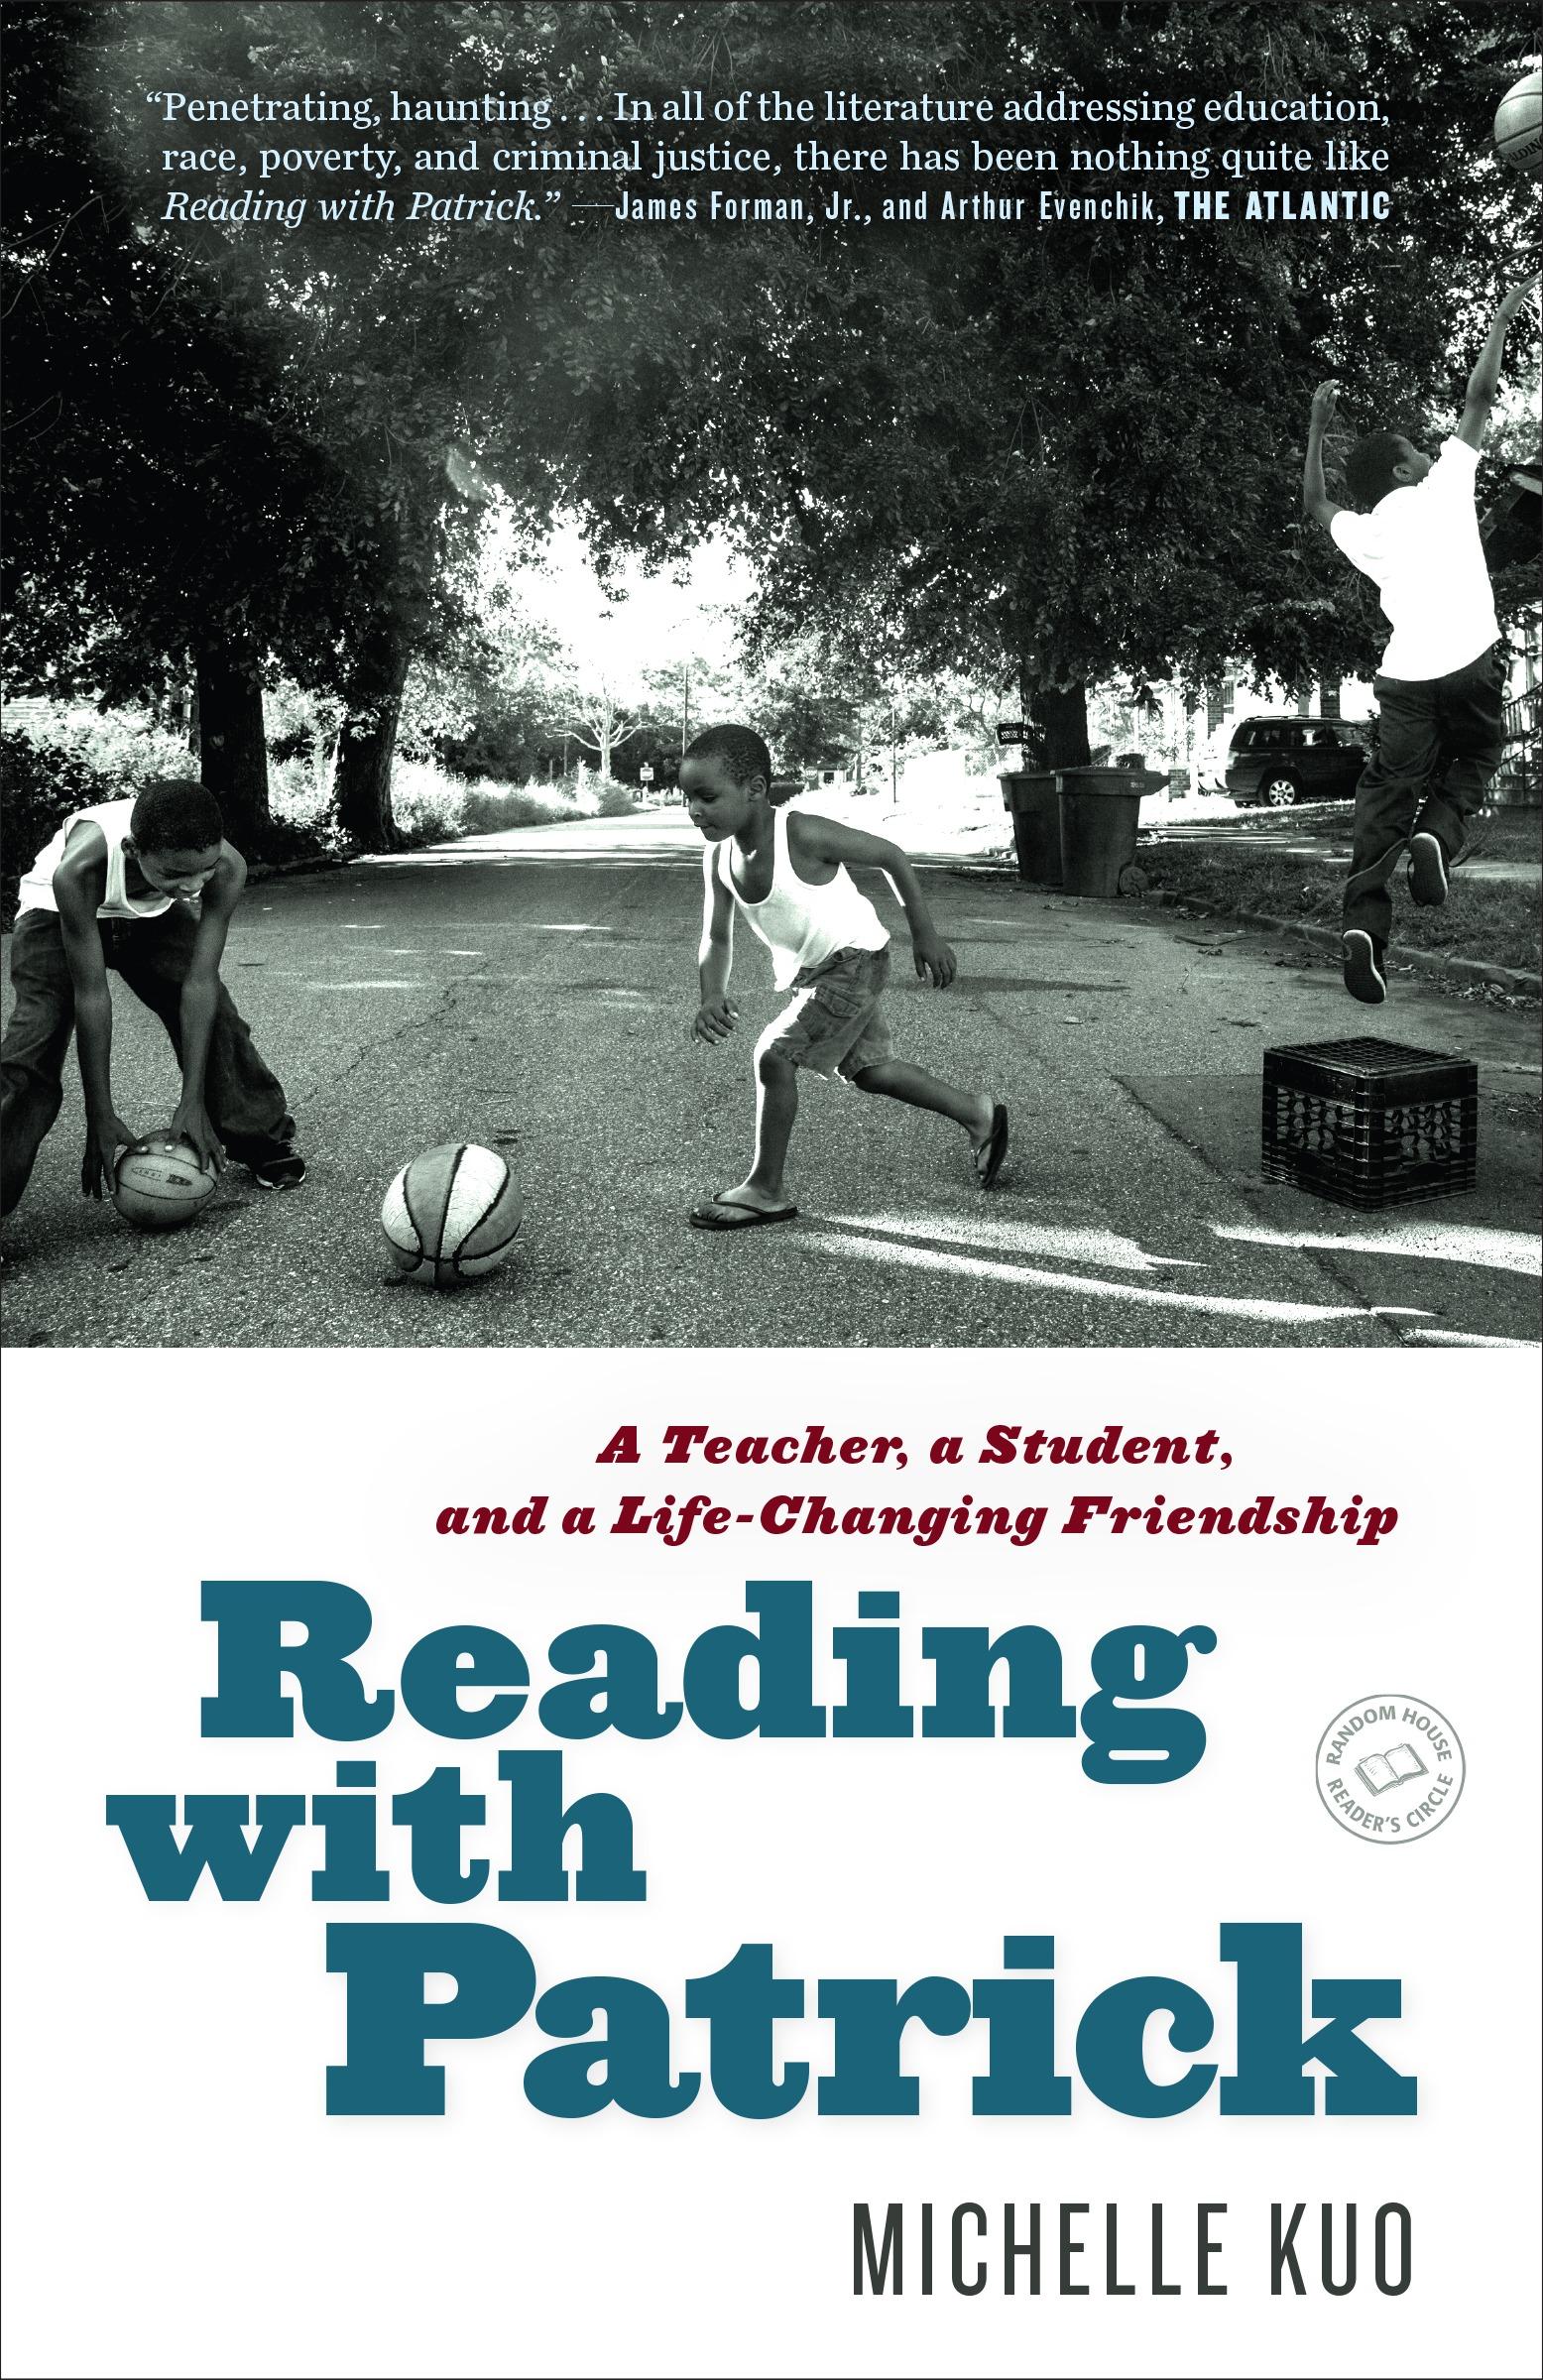 reading_with_Patrick_Paperback.jpg